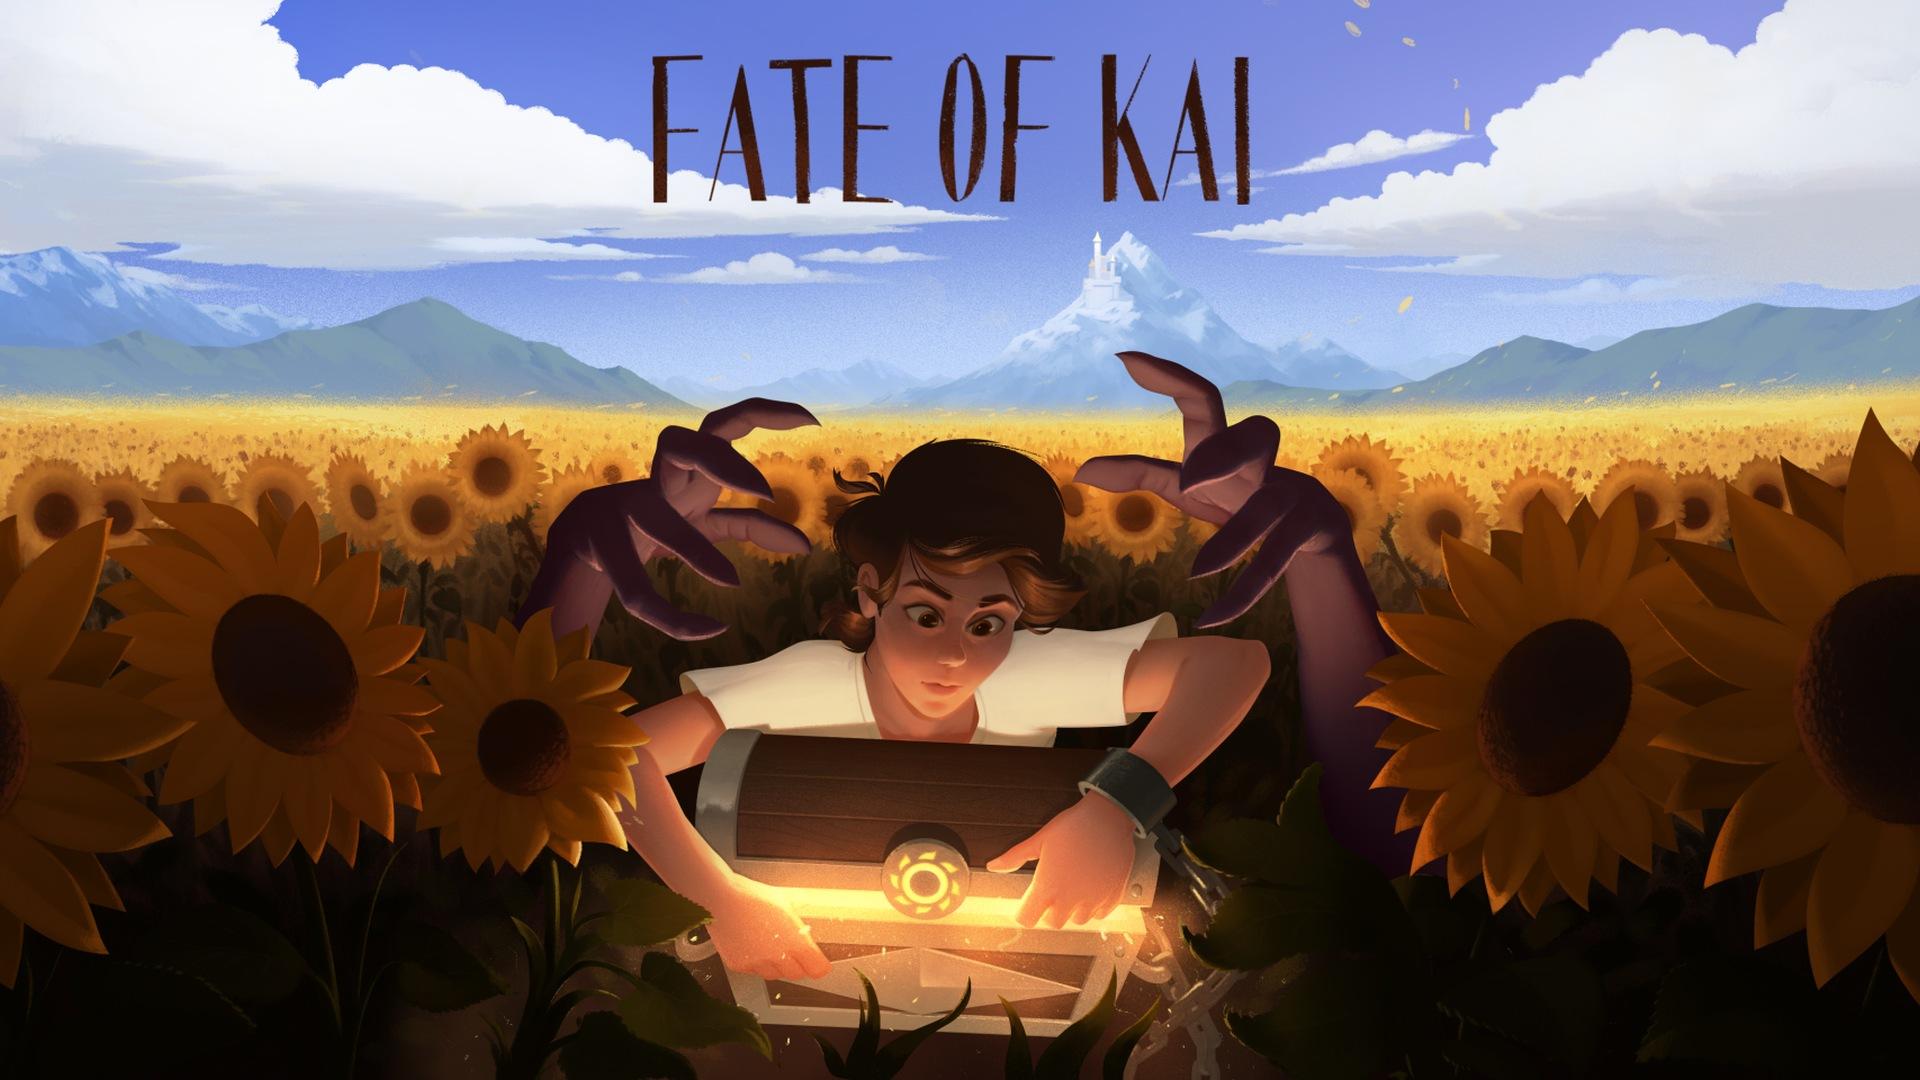 Fate of Kai - banner art | Trylight Game Studio